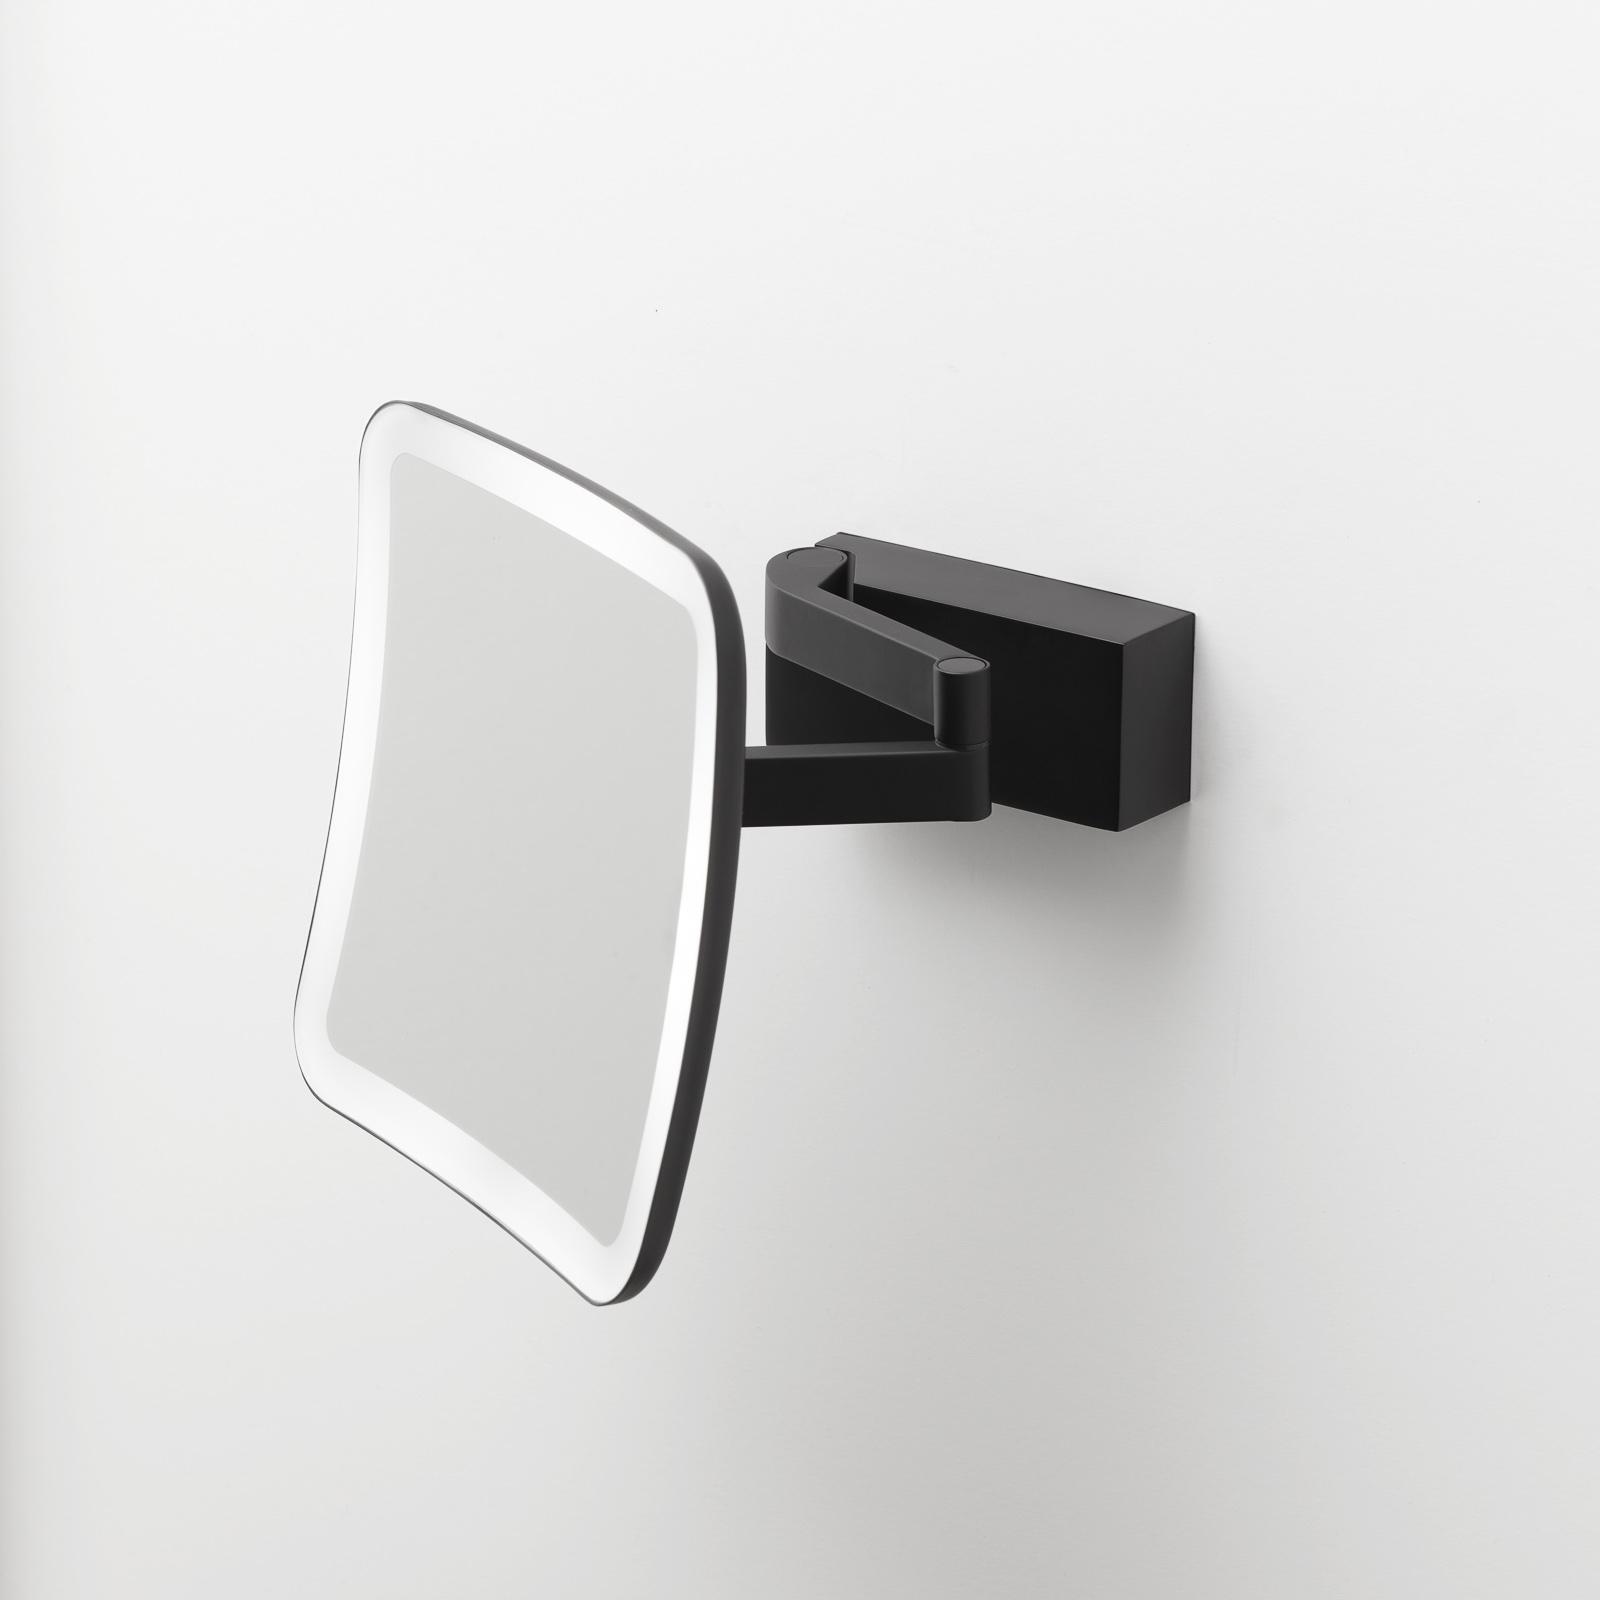 Decor Walther Vision S LED-sminkespeil svart